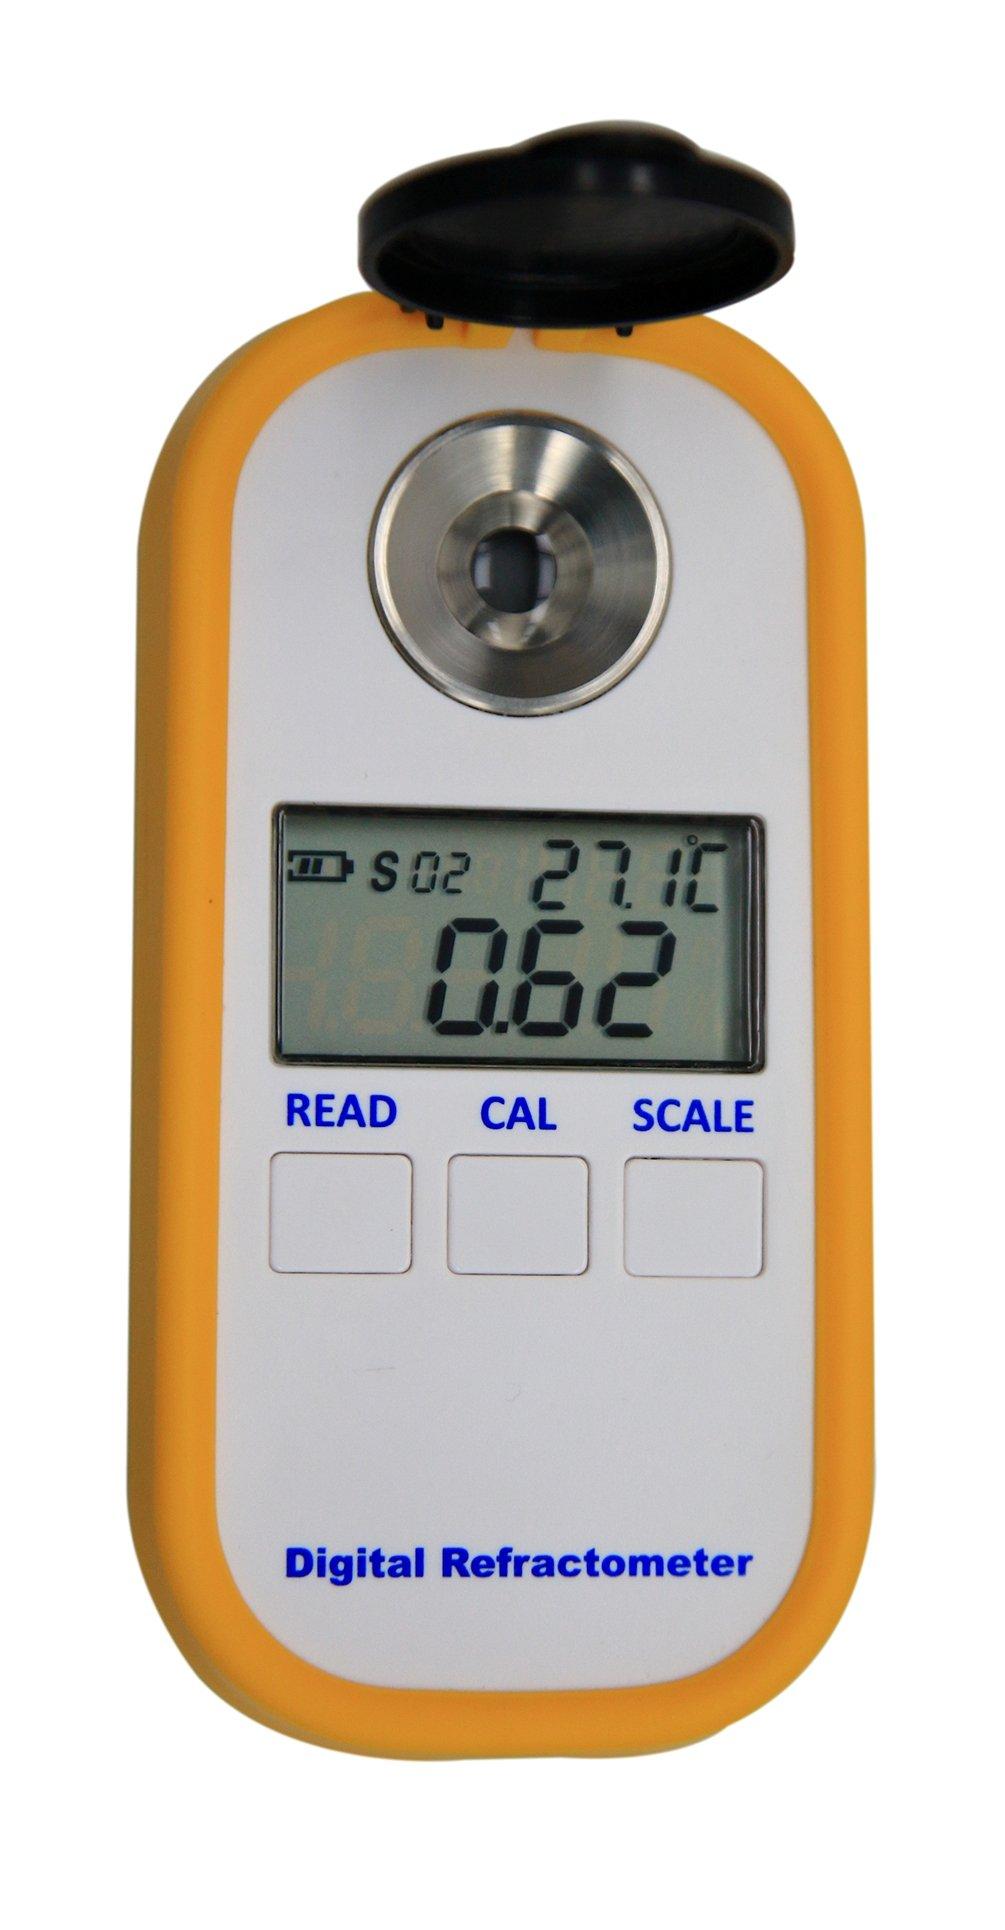 Digital Coffee Densitometer, Coffee Concentration Refractometer, Sugar Drinks Density Meter, Portable Coffee Brix TDS Meter by AMTAST (Image #2)